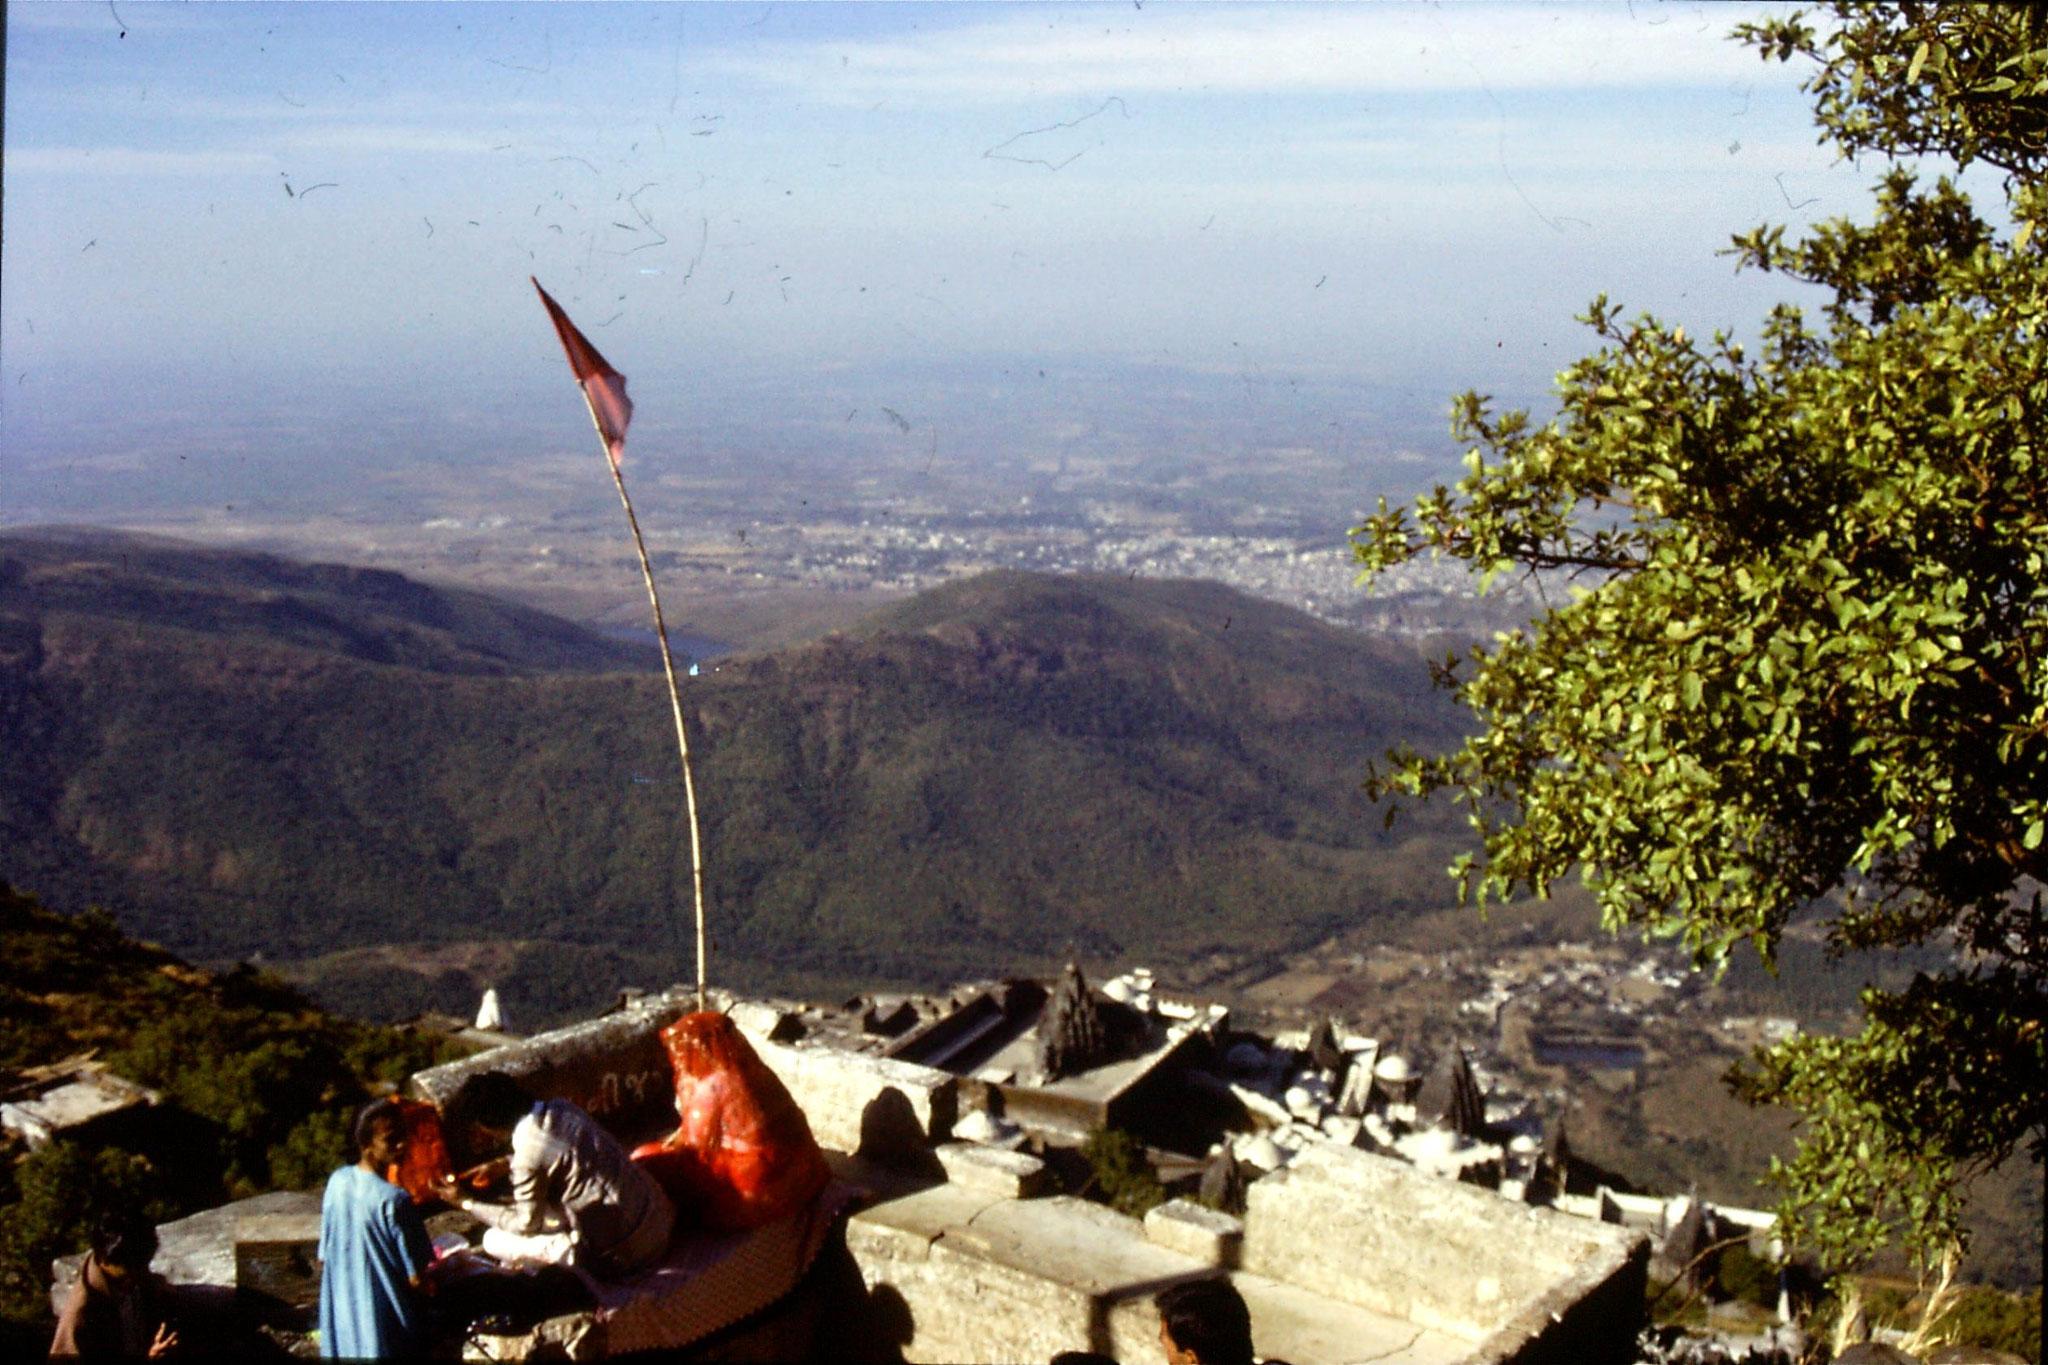 12/12/1989: 1: Junagardh, repainting sacred stone on Mt Girnar